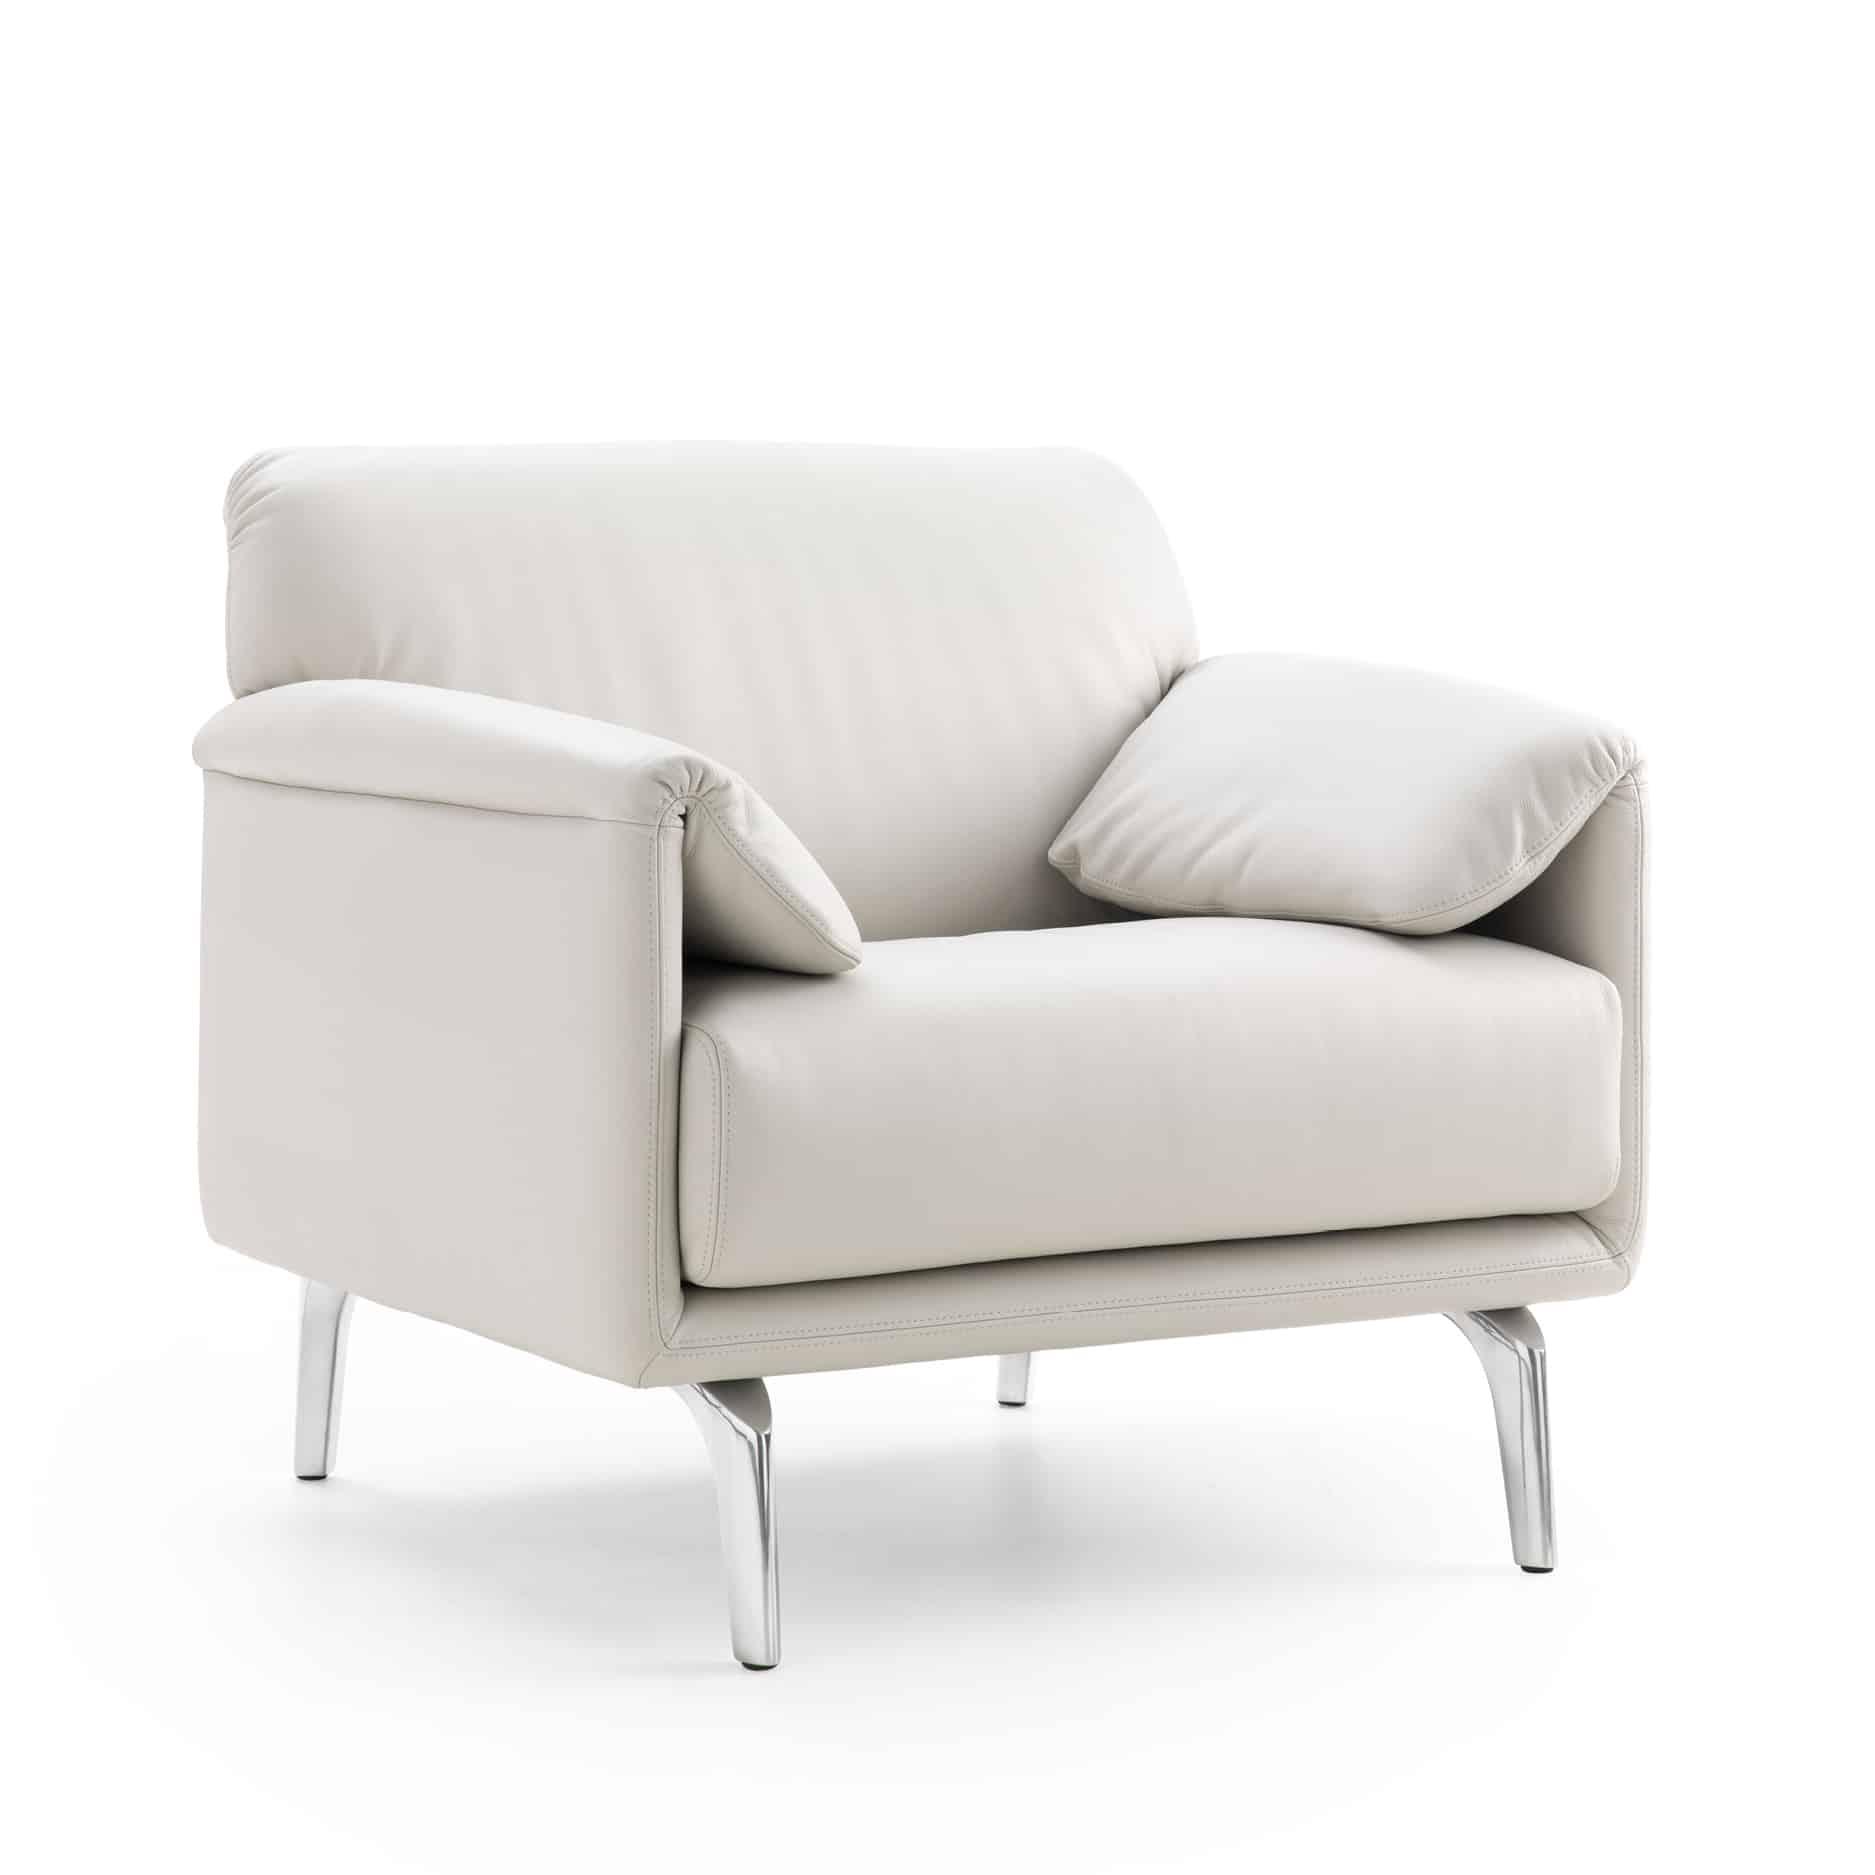 Leolux fauteuil Bora balanza